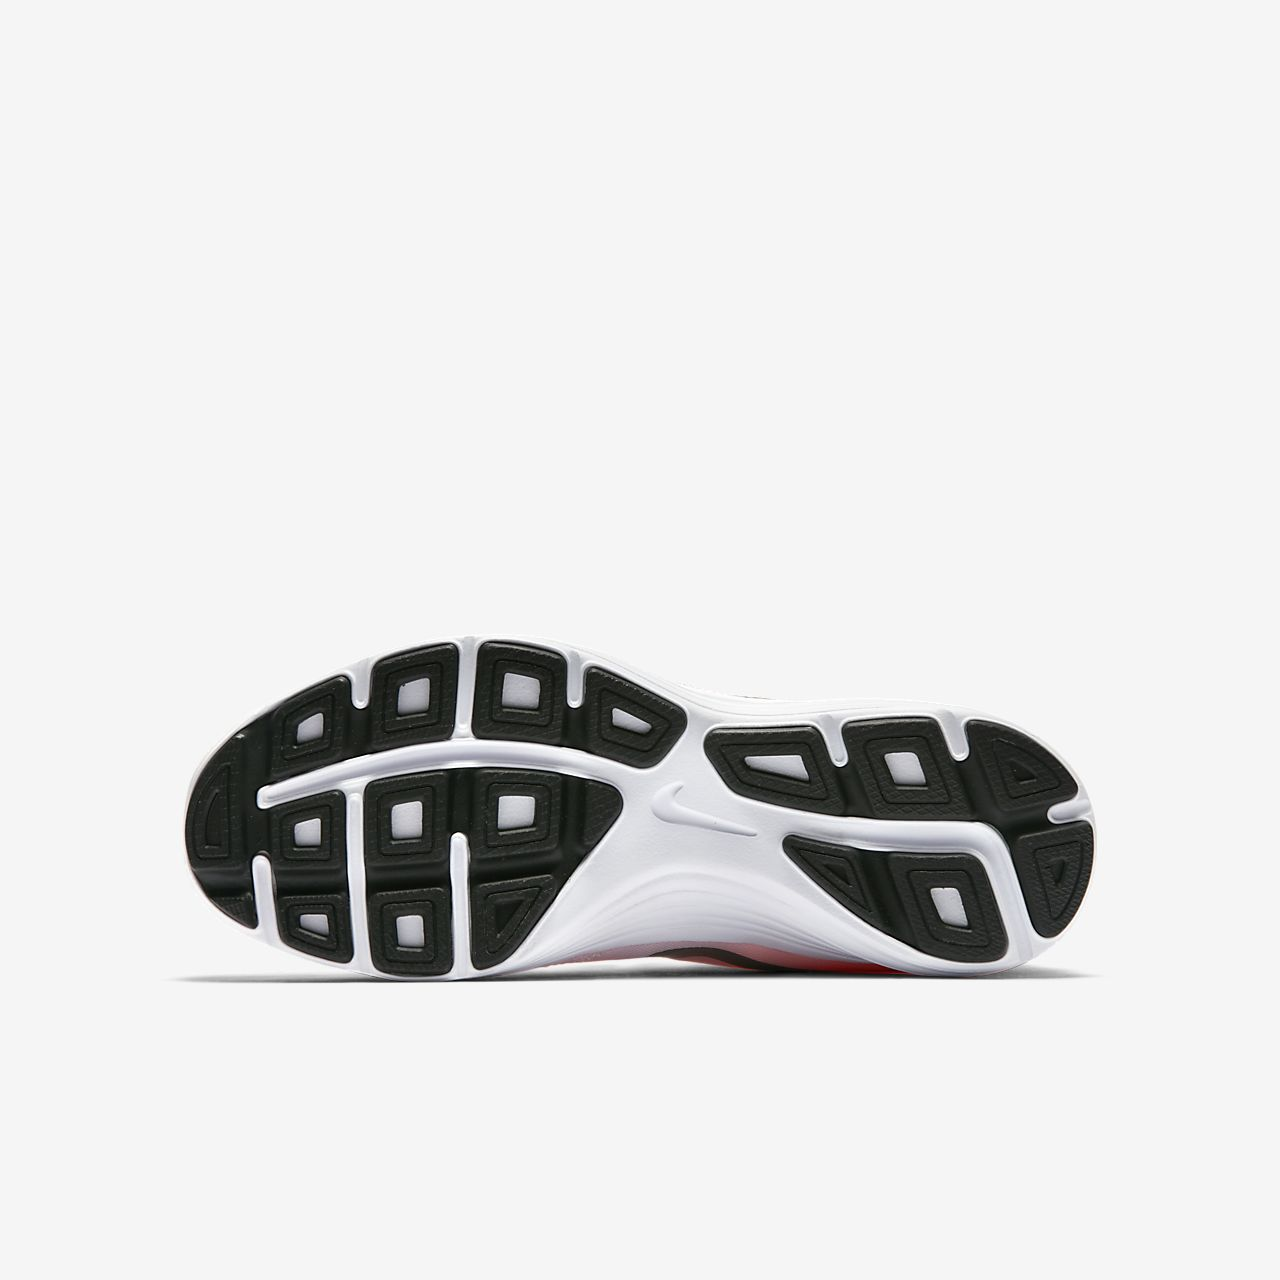 promo code 11e91 61288 ... Nike Revolution 3 Laufschuh für ältere Kinder